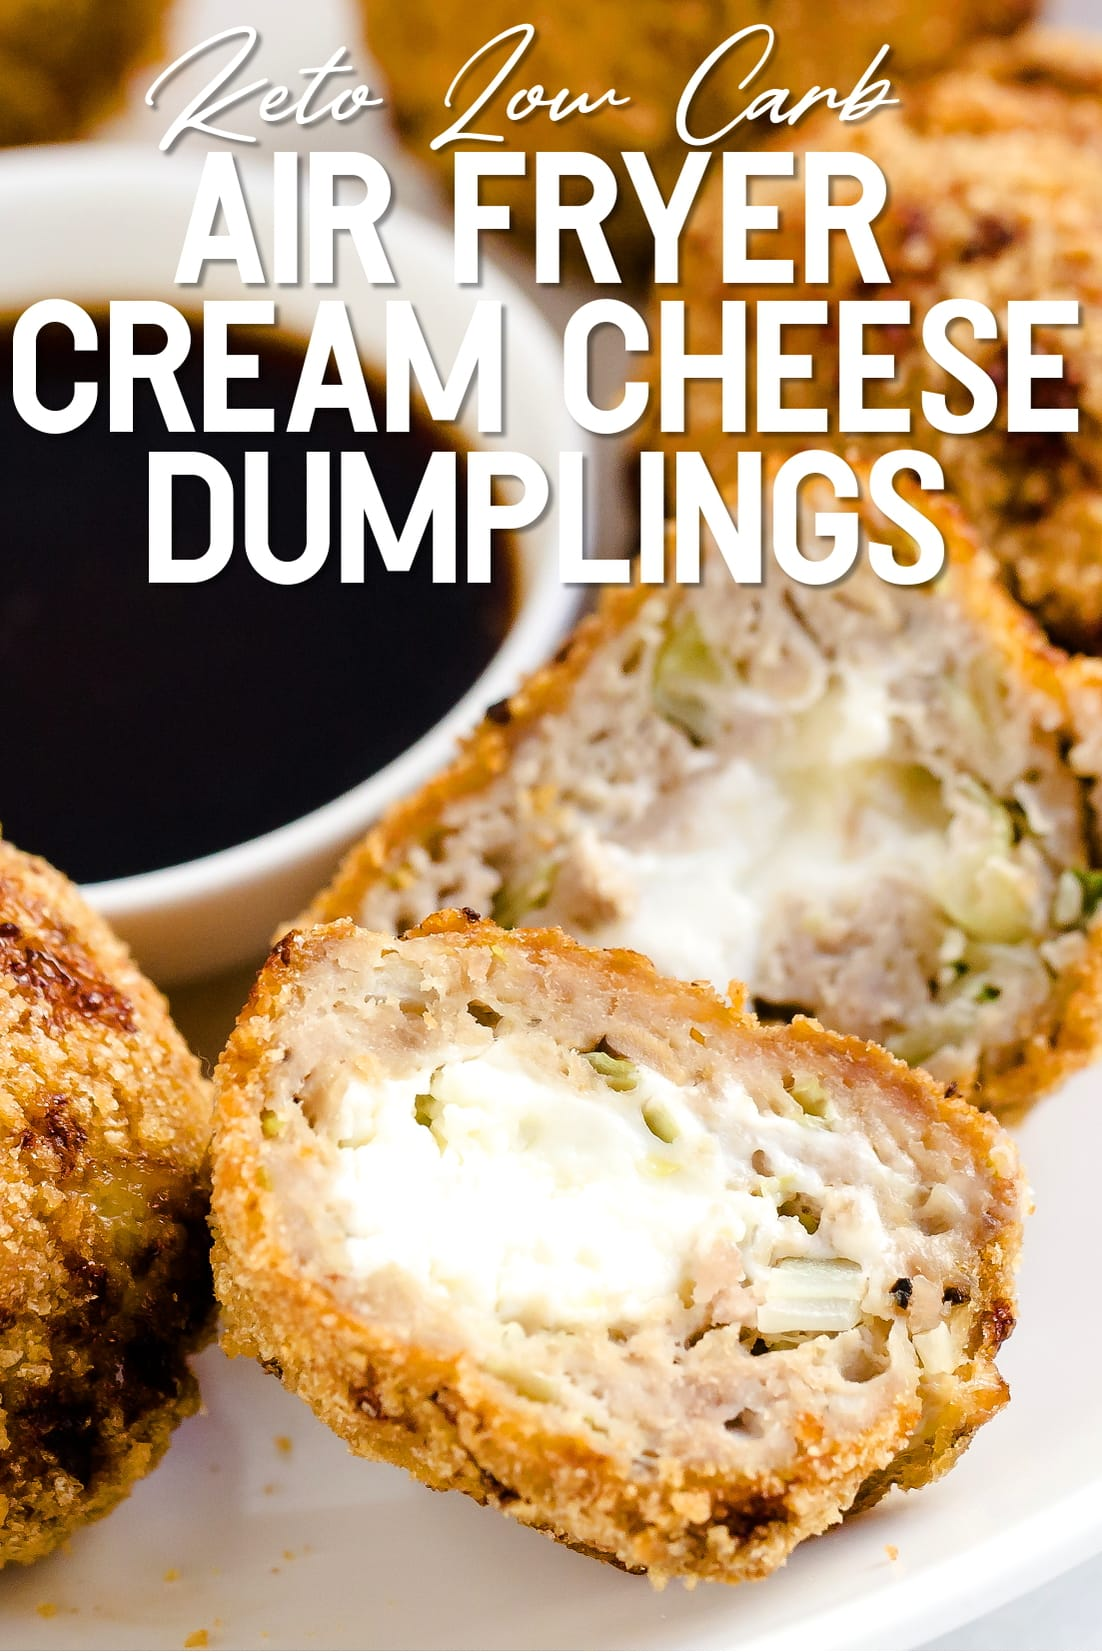 Air Fryer Cream Cheese Dumplings cut in half on a plate